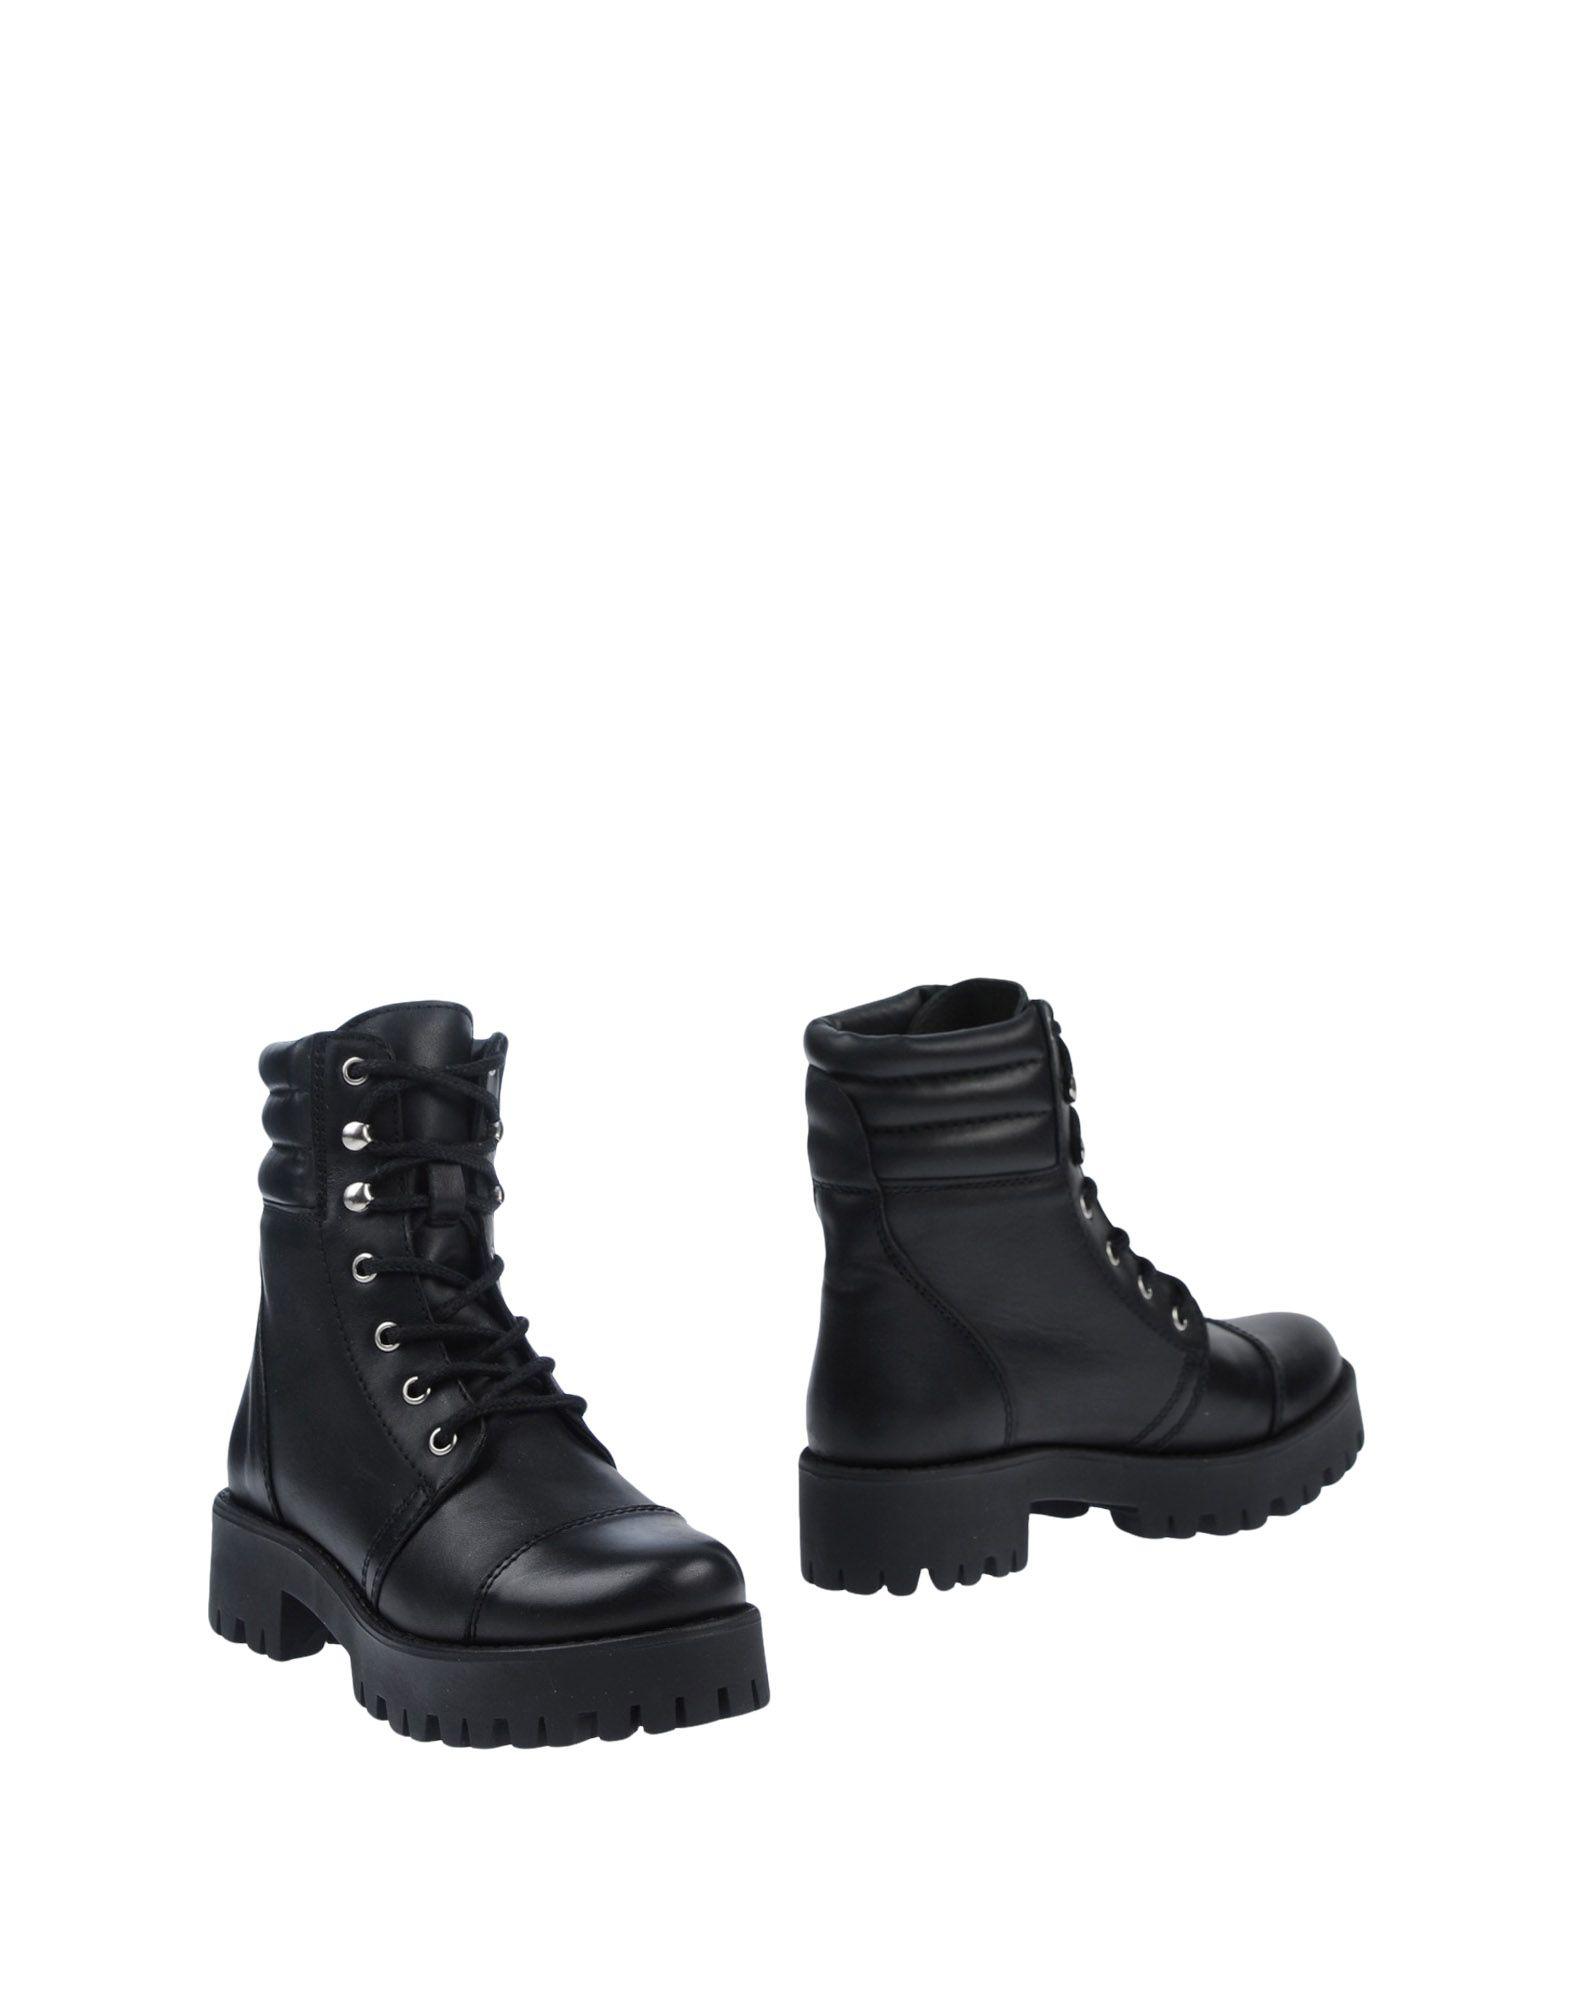 Steve 11509290HB Madden Stiefelette Damen  11509290HB Steve Gute Qualität beliebte Schuhe 88abc2